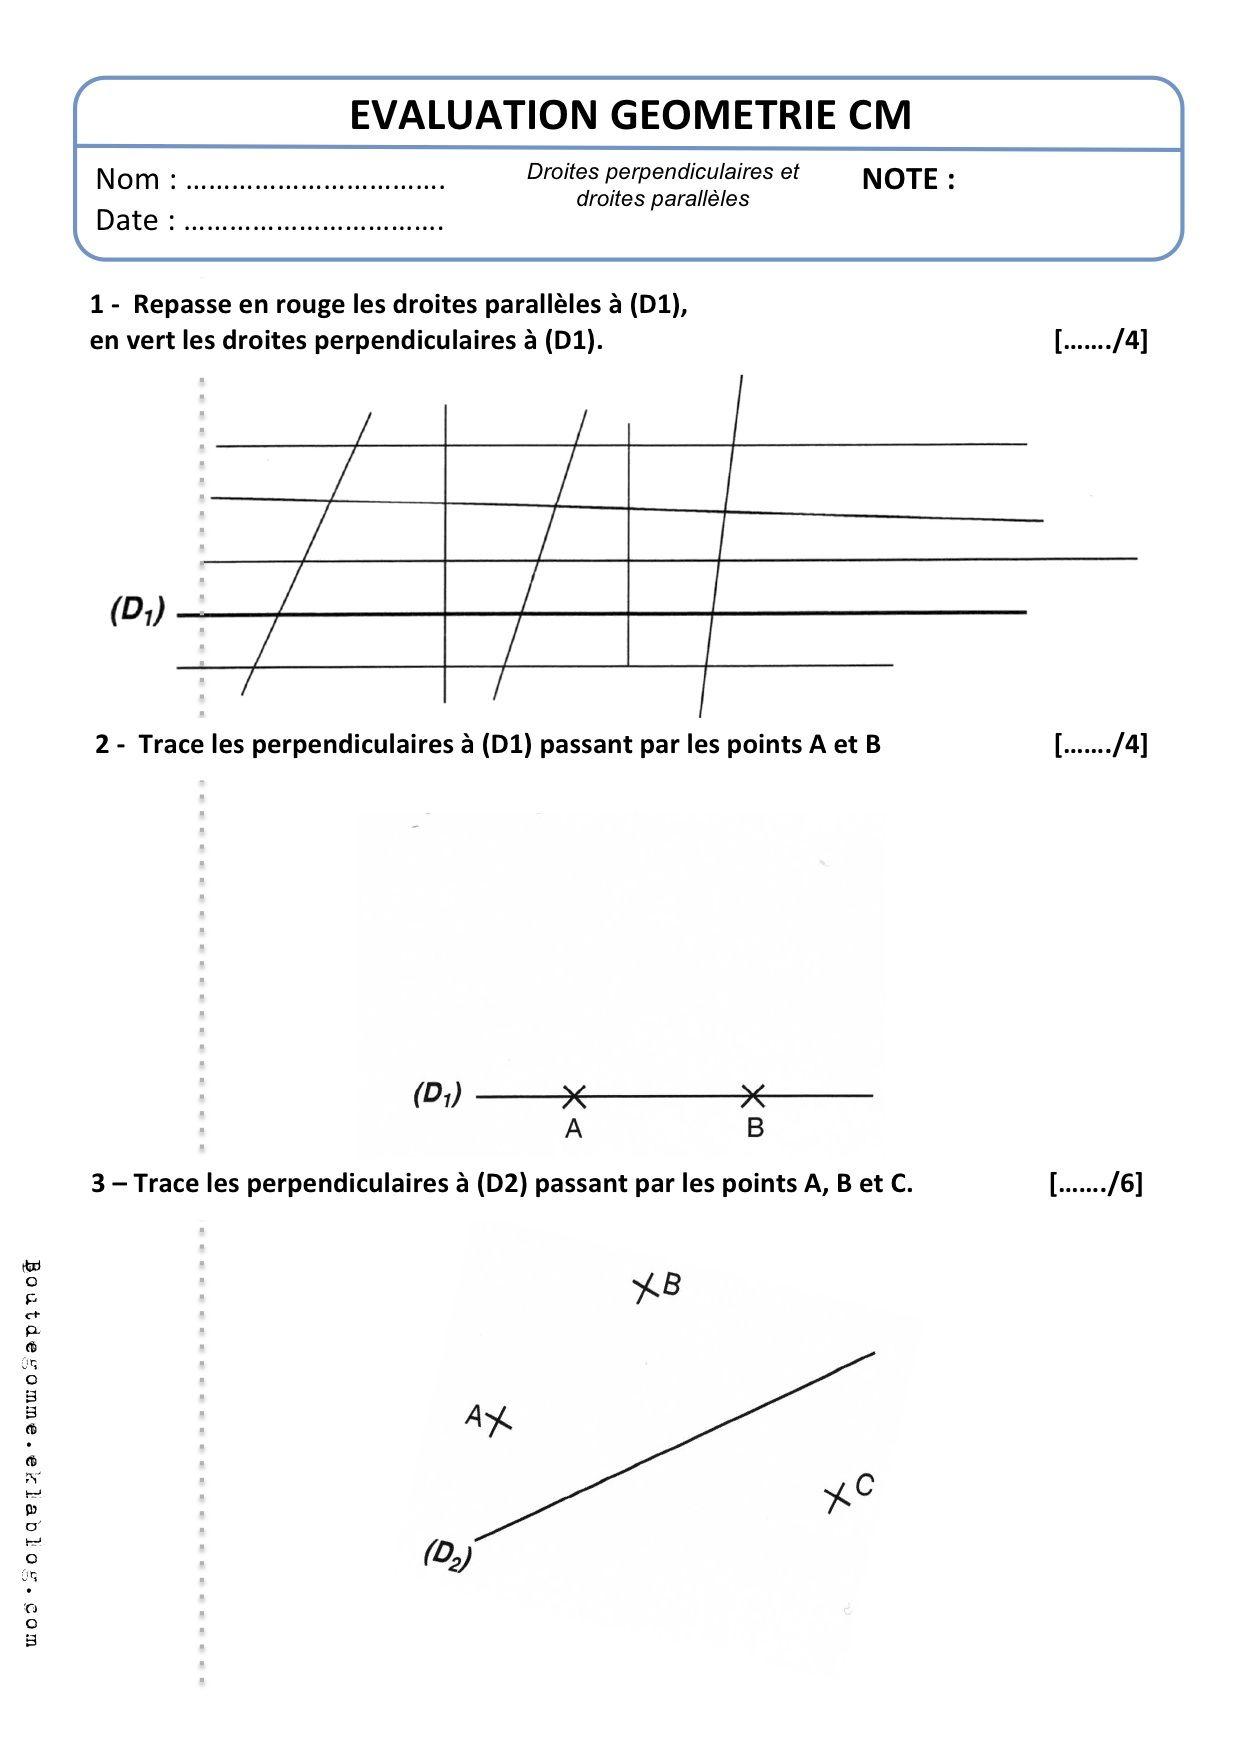 Tp3pyrsc2 Hy9jf1okqyxp82gdg Jpg 1 241 1 754 Pixels Geometrie Geometrie Cm2 Evaluation Cm2